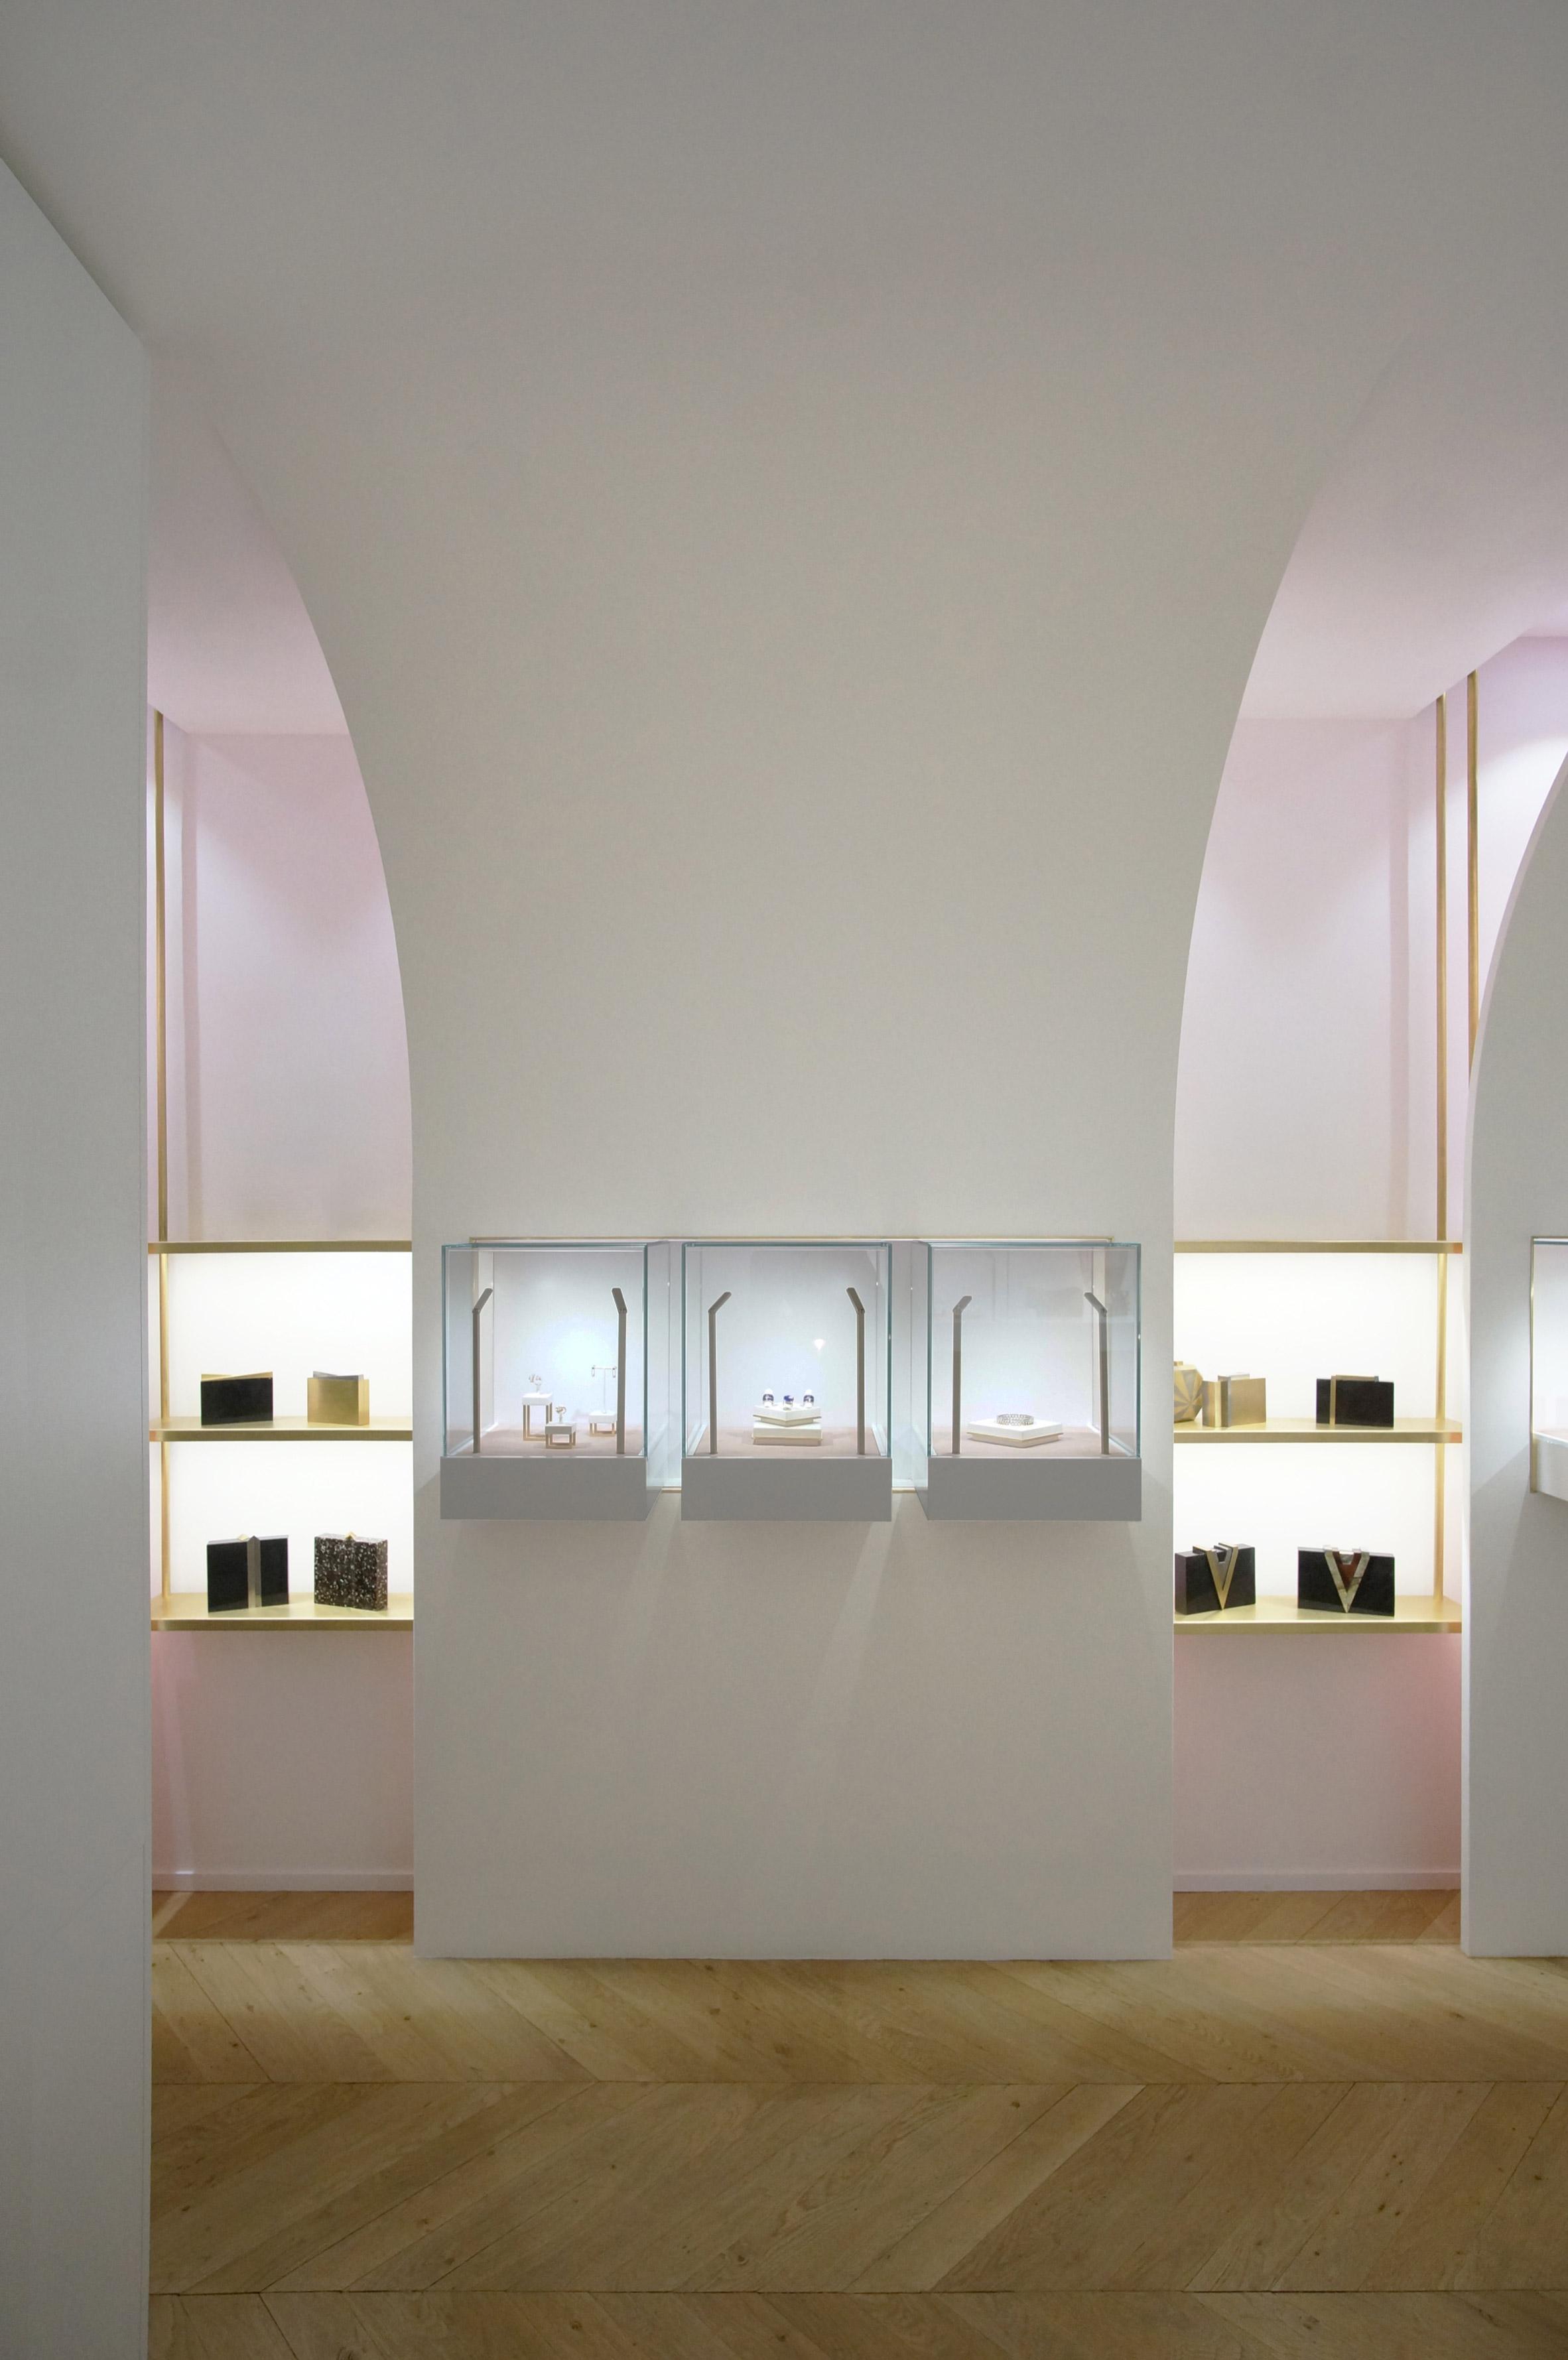 nuun-jewellery-shop-java-architectes-interiors-retail-paris-france_dezeen_2364_col_2.jpg